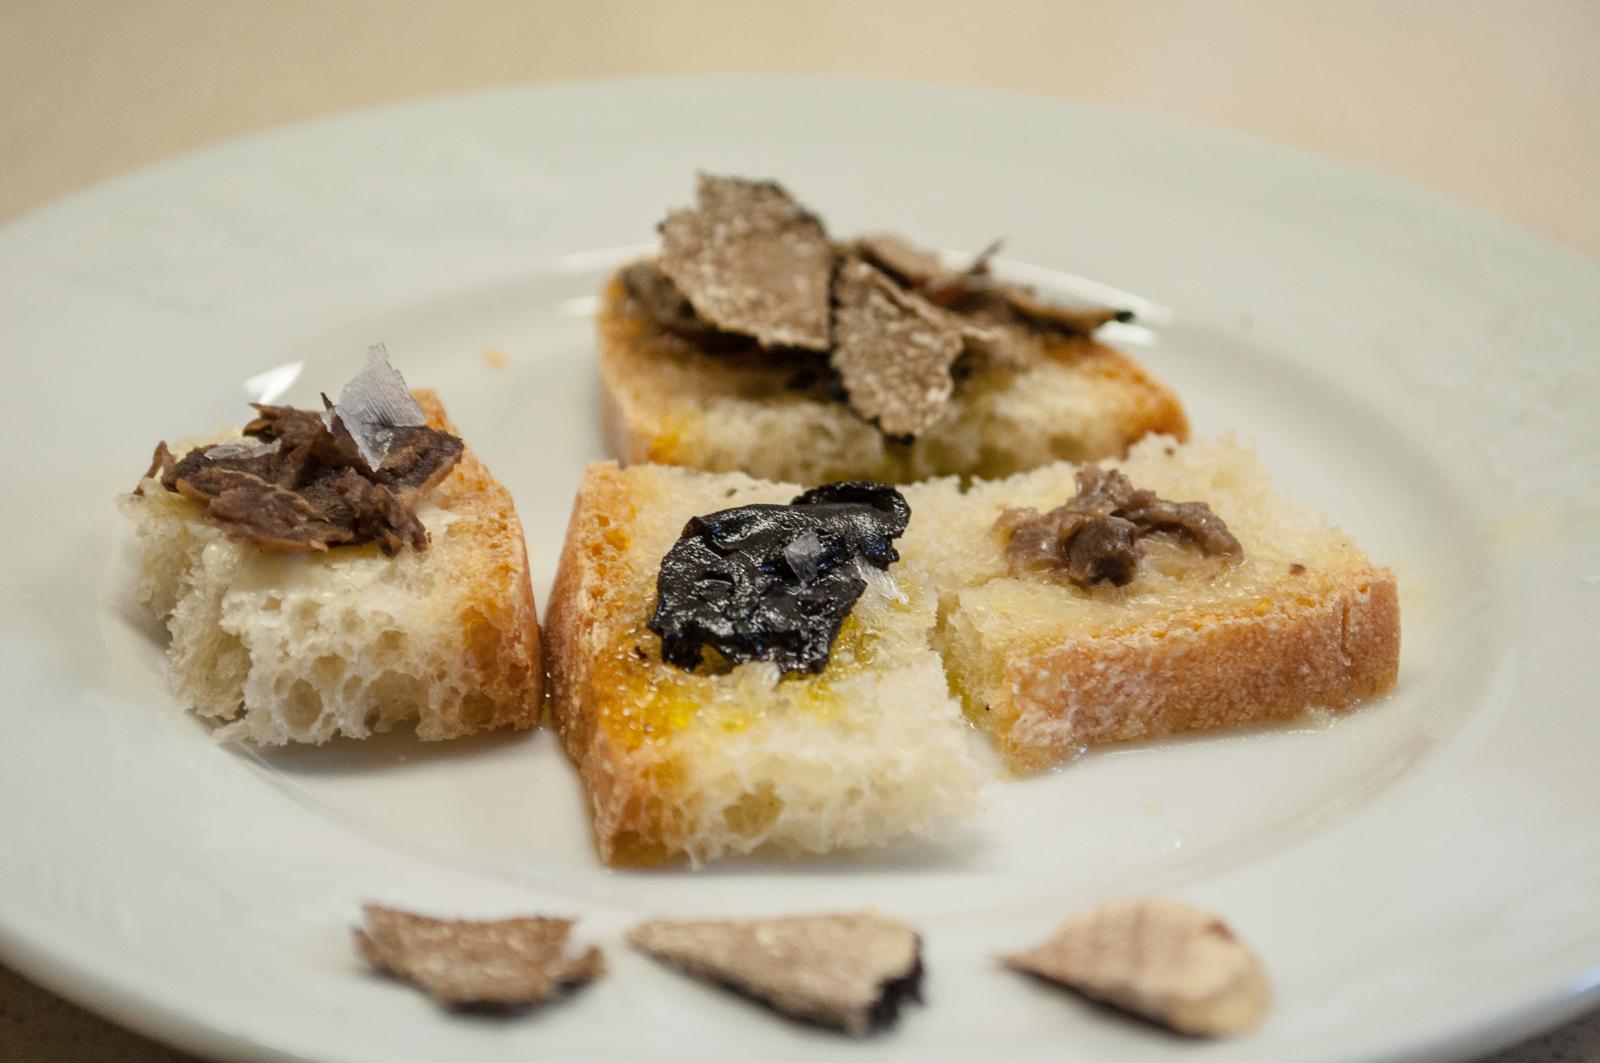 Umbria Truffles